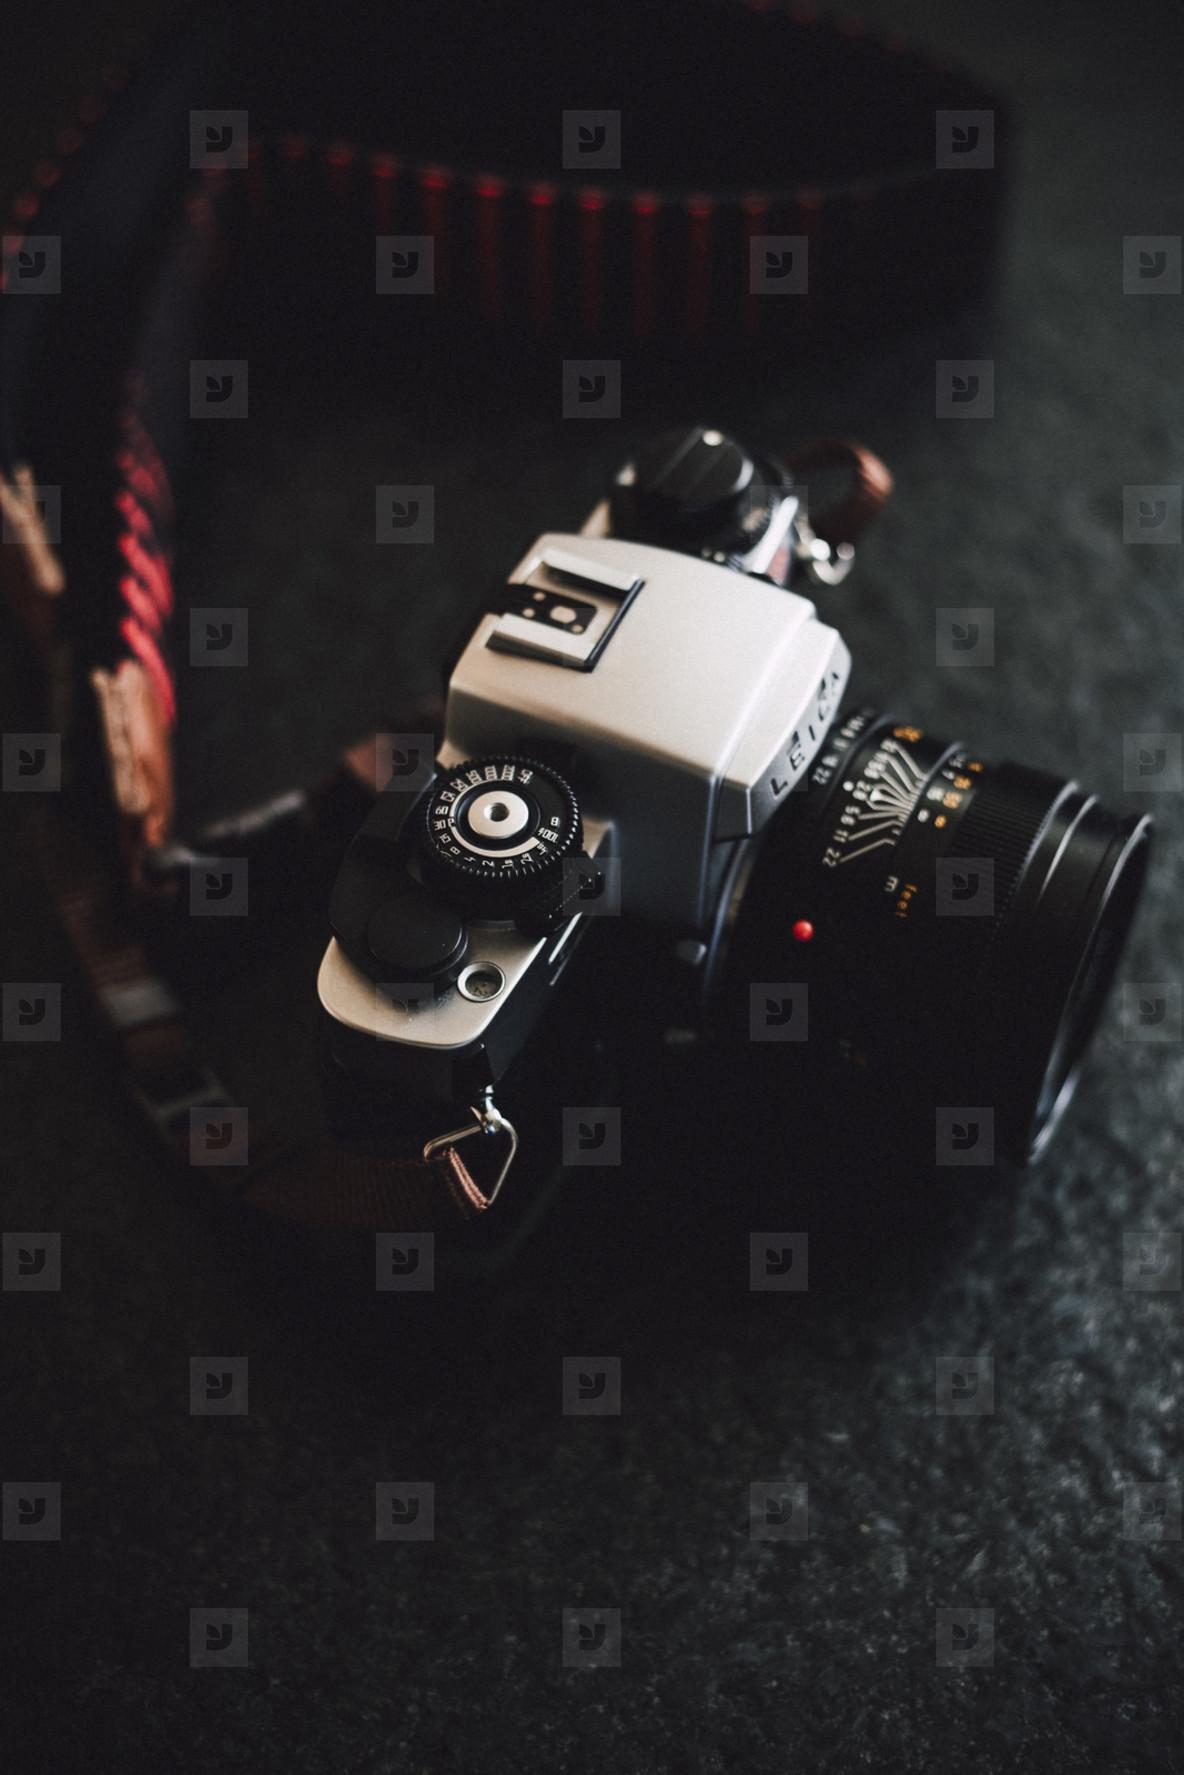 analog single lens reflex camera